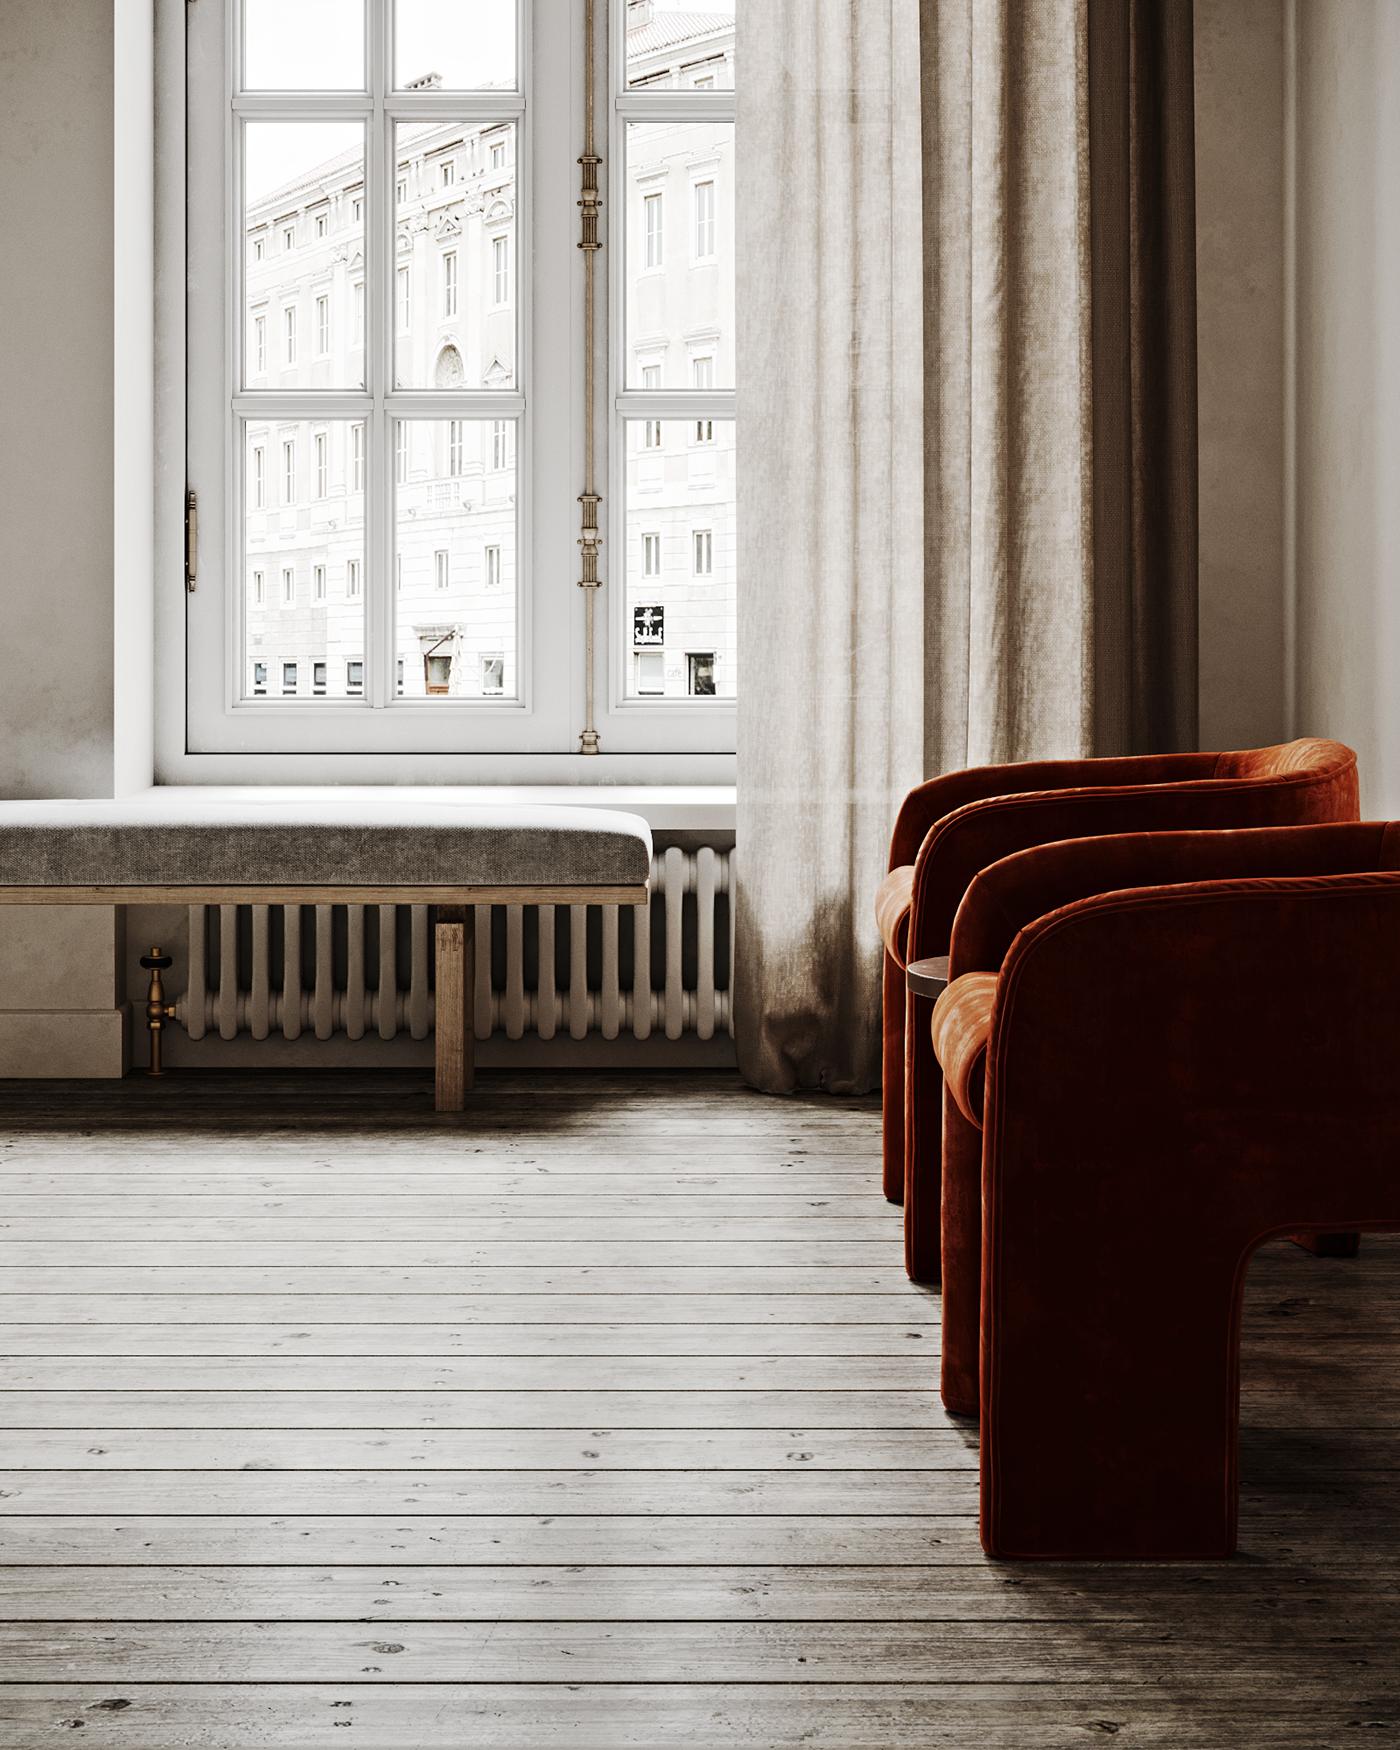 interiordesign design Scandinavian Minimalists softinterior andtradition jaimehayon JørnUtzon Kopenhagen yellowtrace